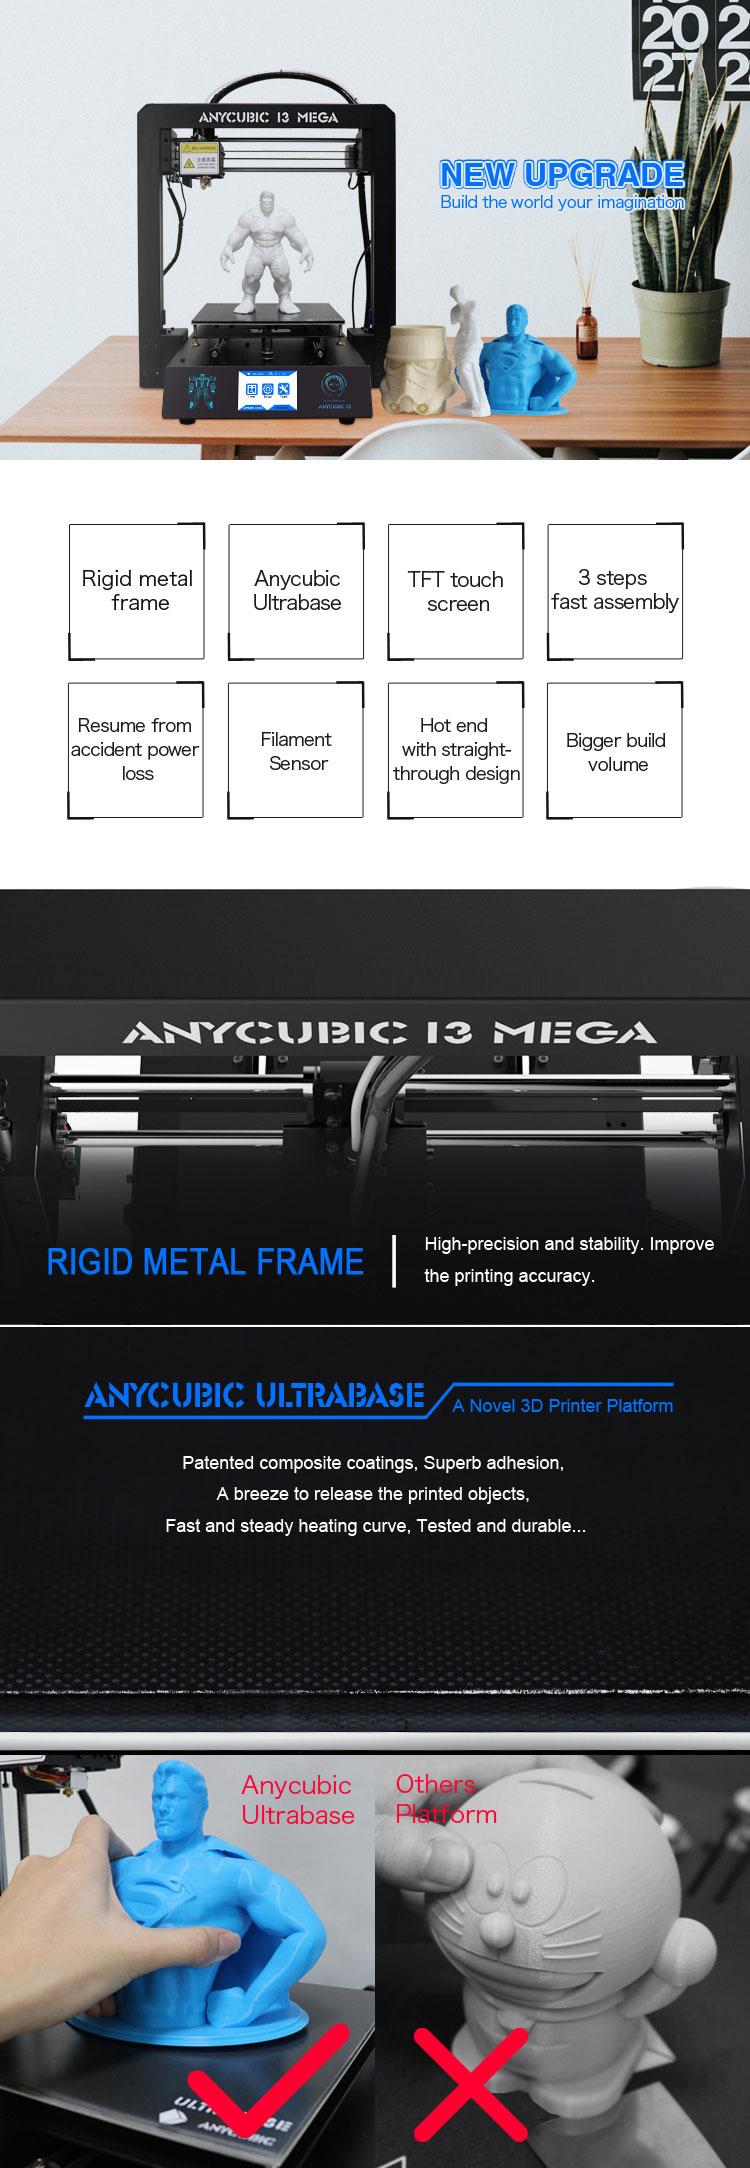 Anycubic 3D printer impresora 3d I3 Mega full metal imprimante 3d High Precision Patented Lattice Platform 3d printer kit (2)